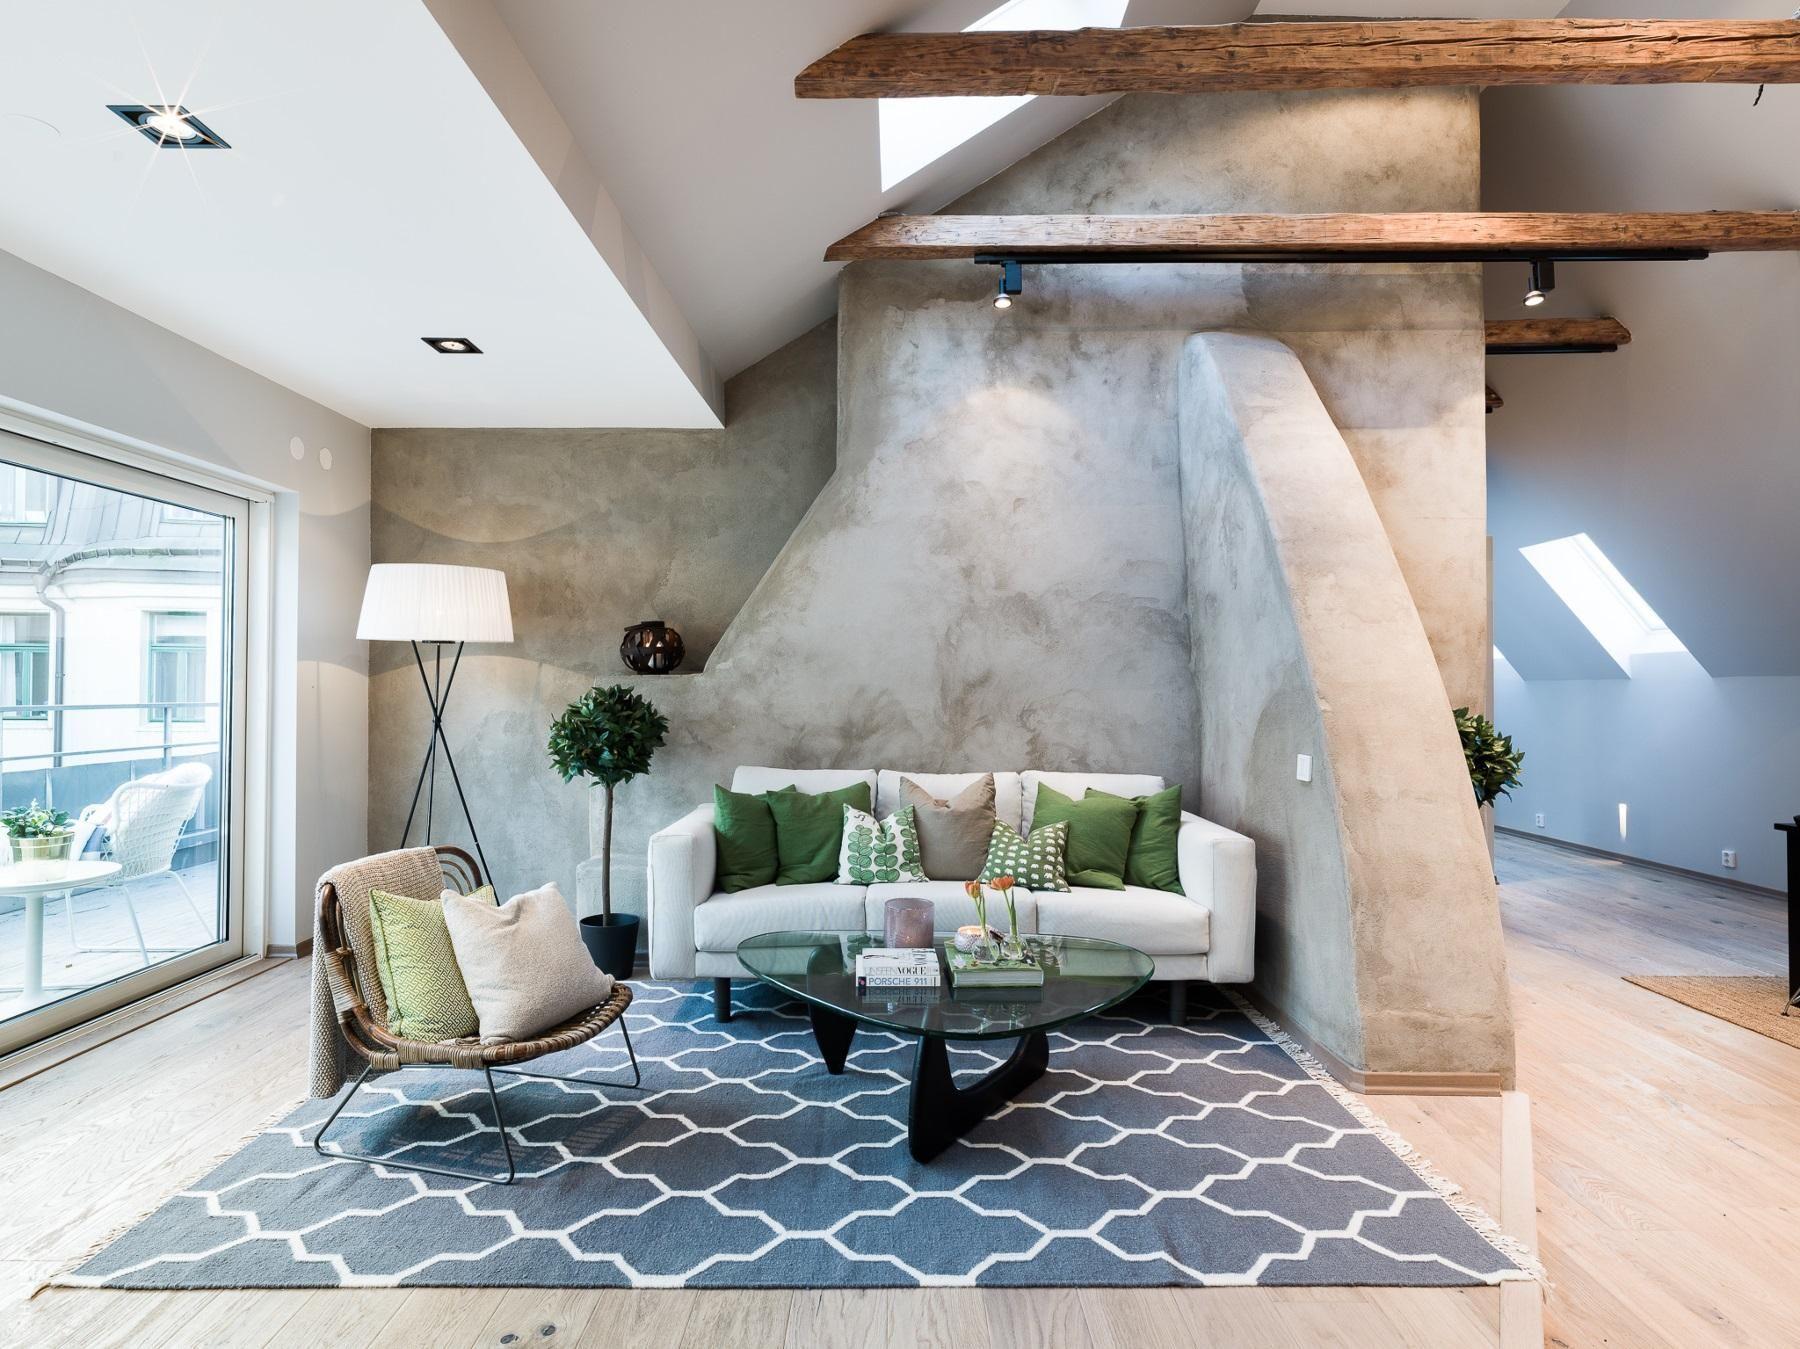 Murs Effet Sous Les Toits Attic Living Roomsattic